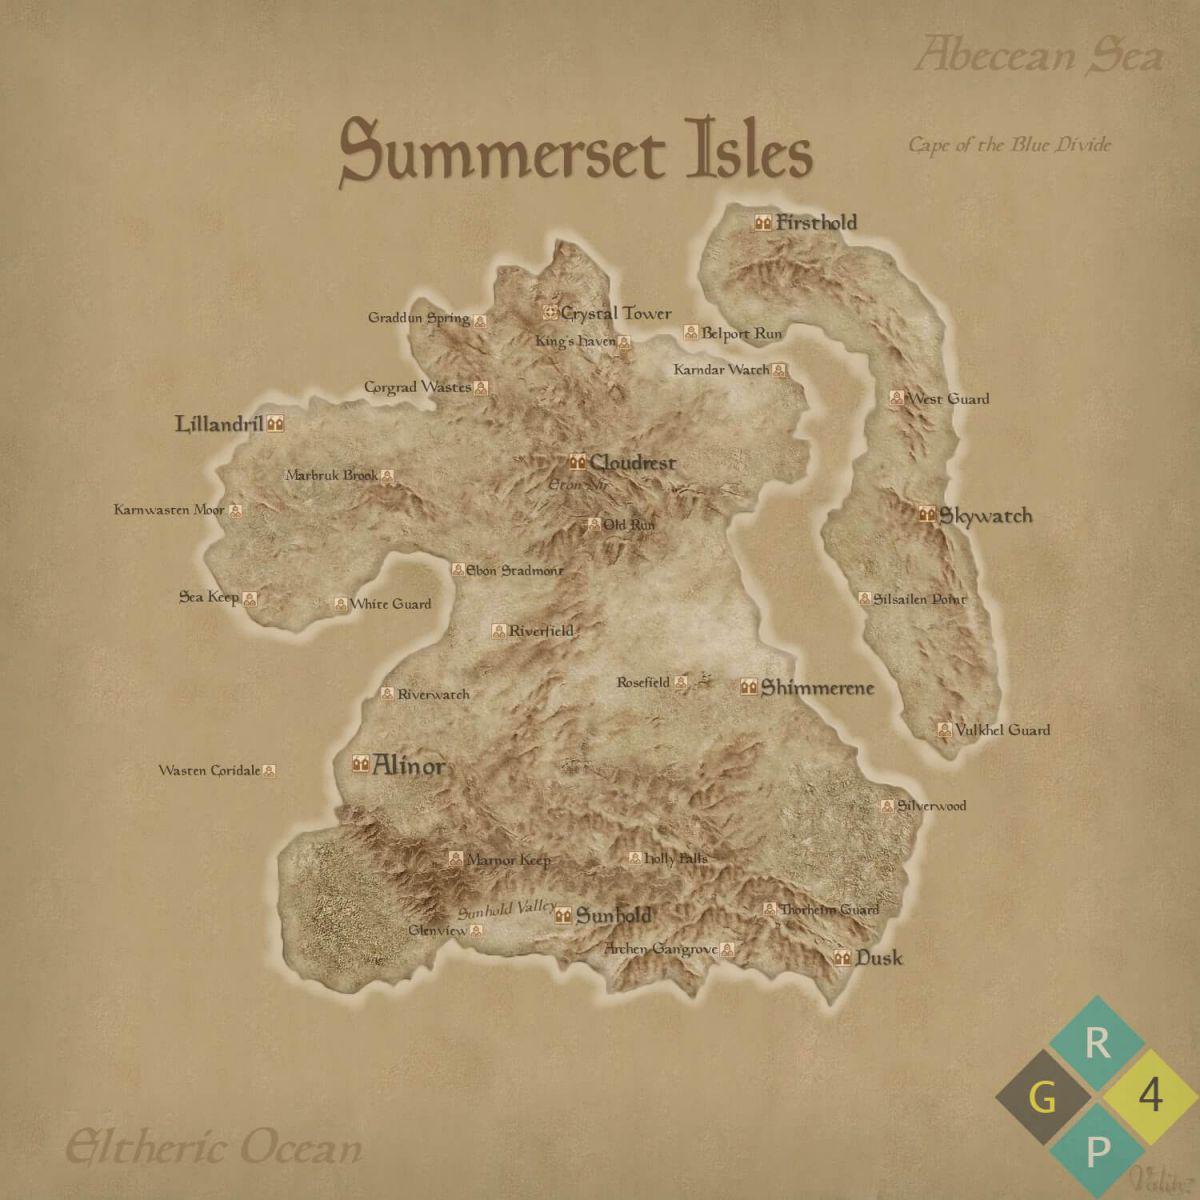 The Elder Scrolls Online Map Of Summerset Isles Expansion - r4pg com